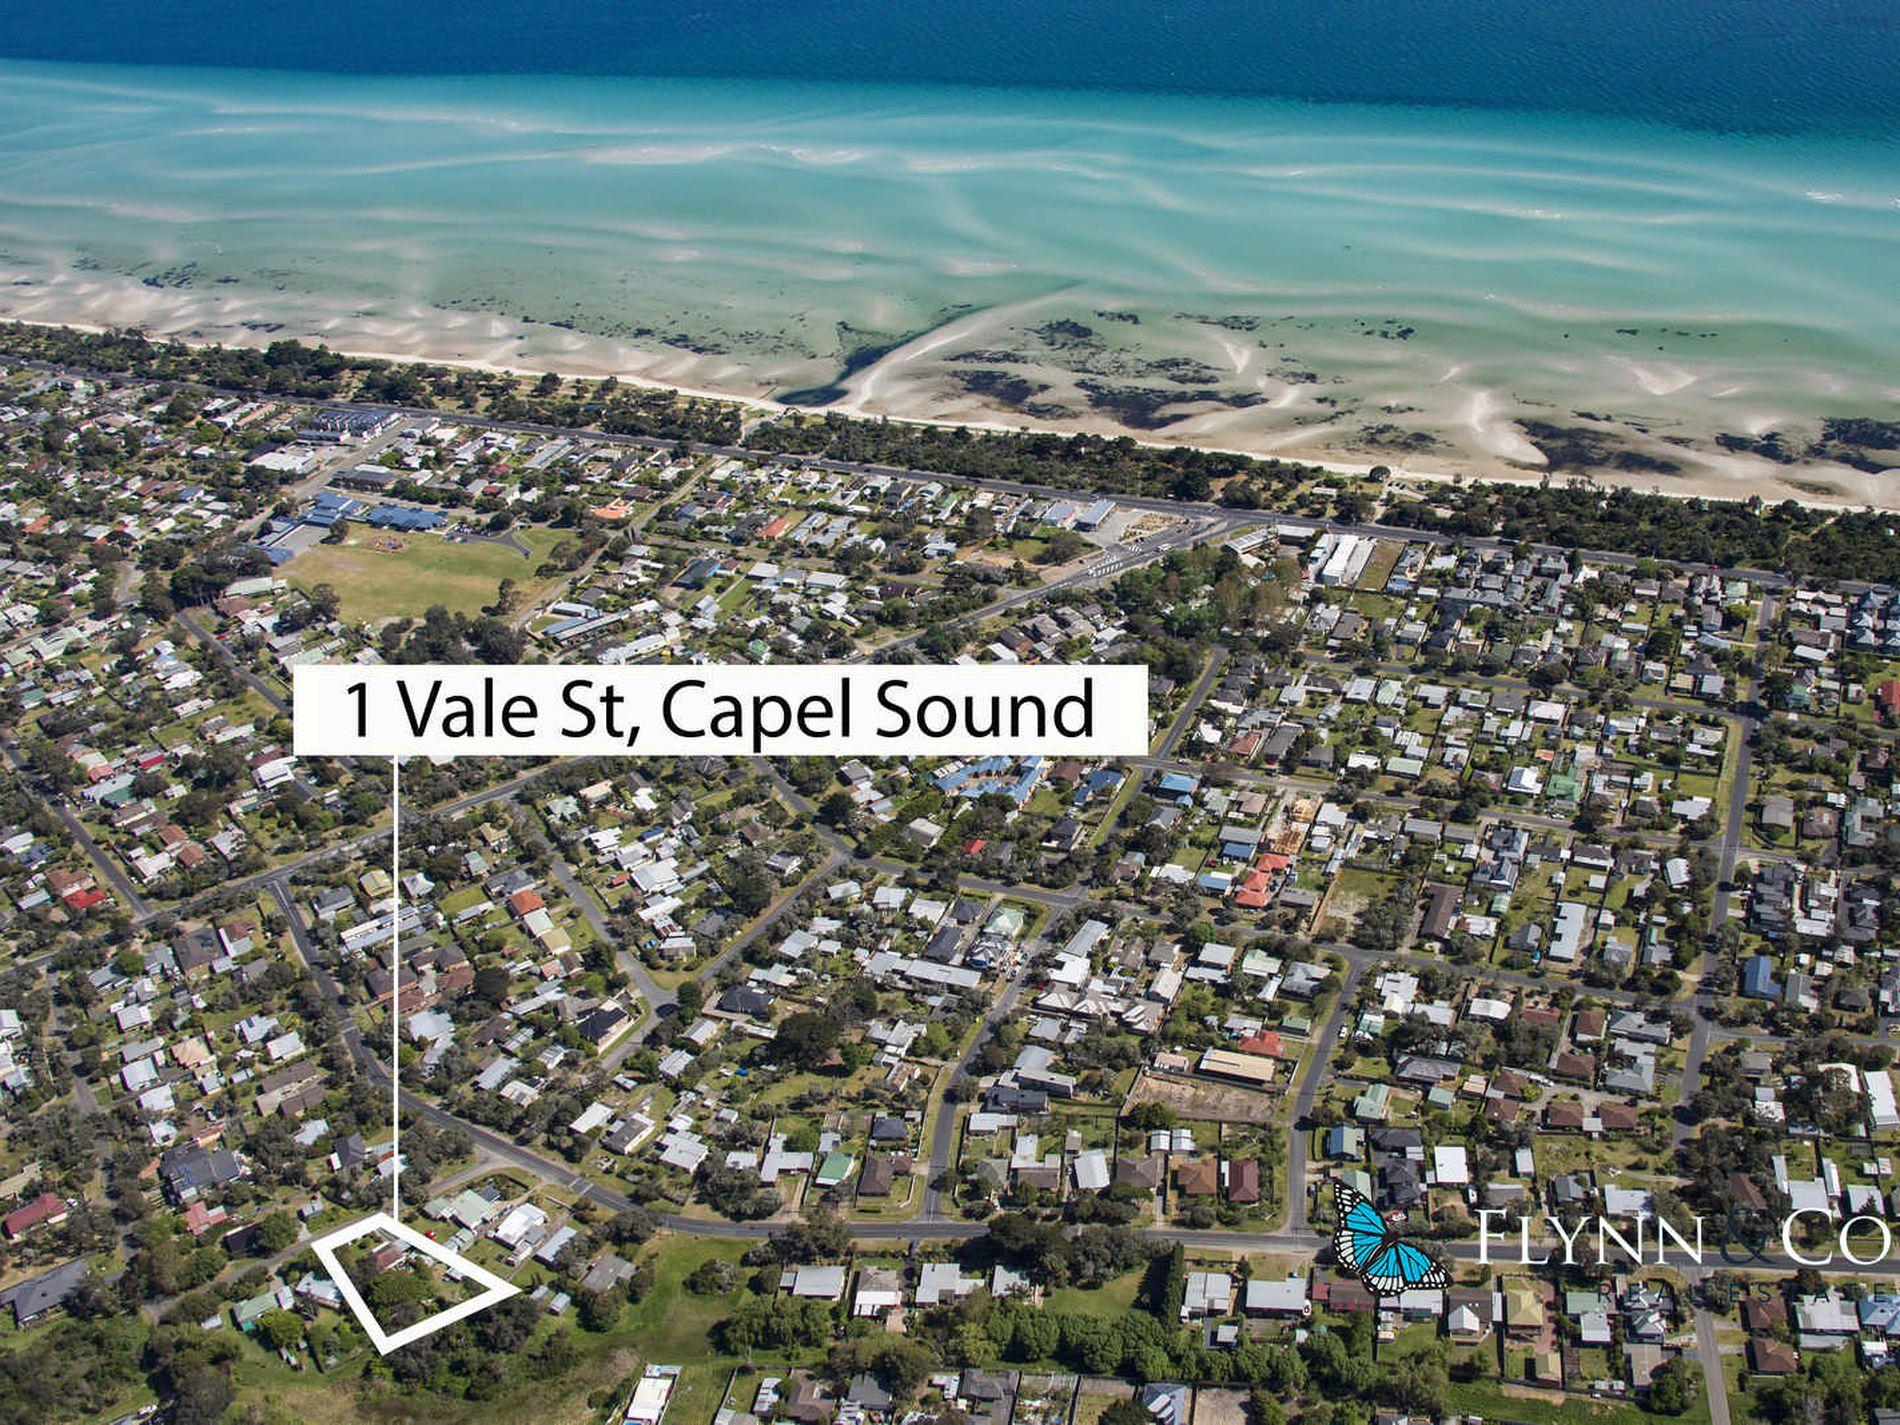 1 Vale Street, Capel Sound